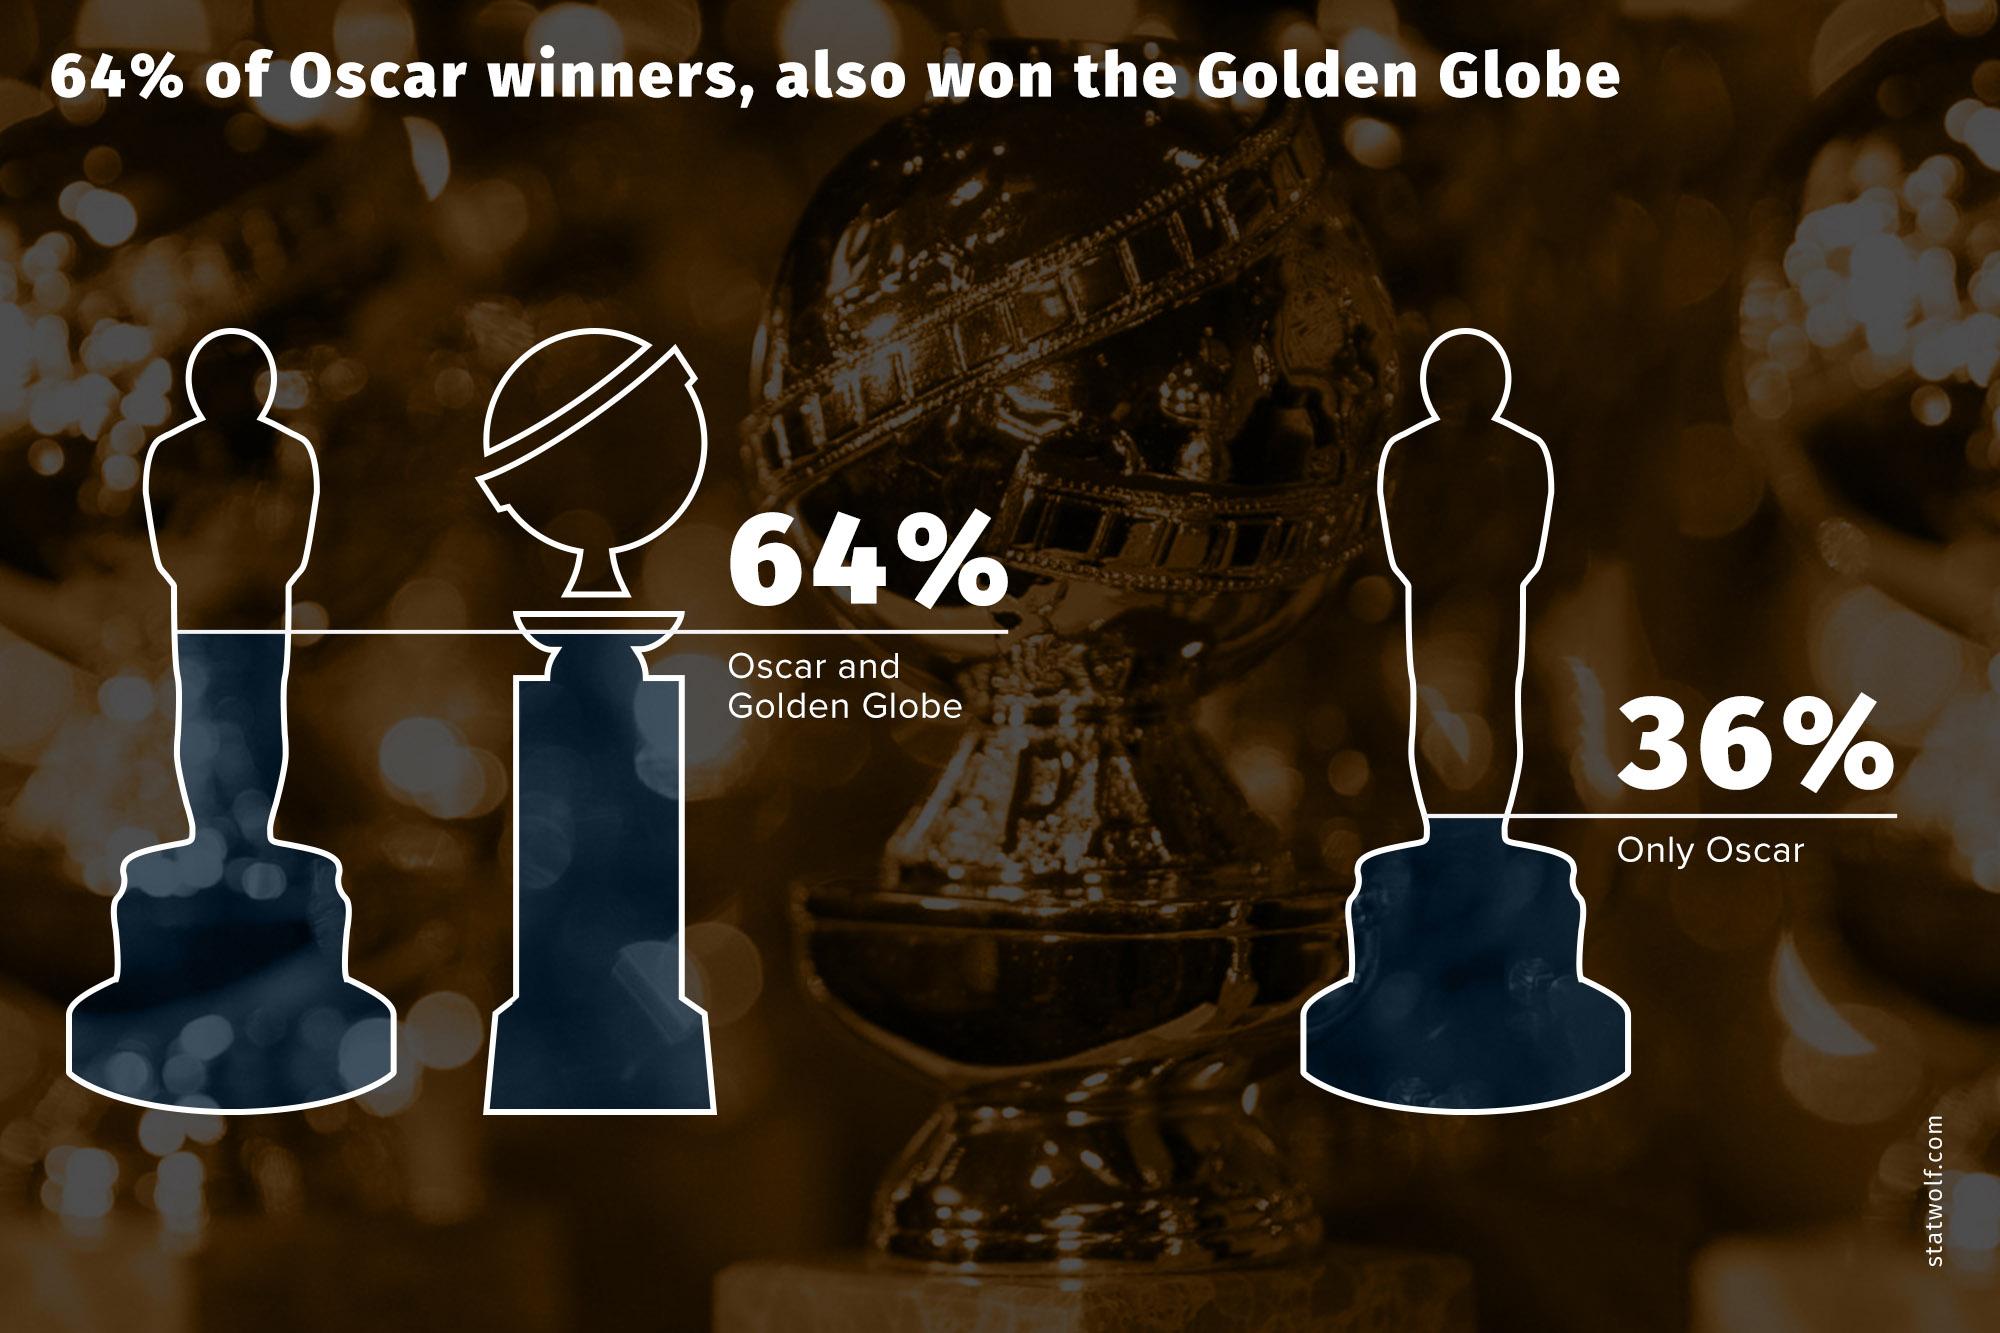 64% Of Oscar Winner, Also Won The Golden Globe